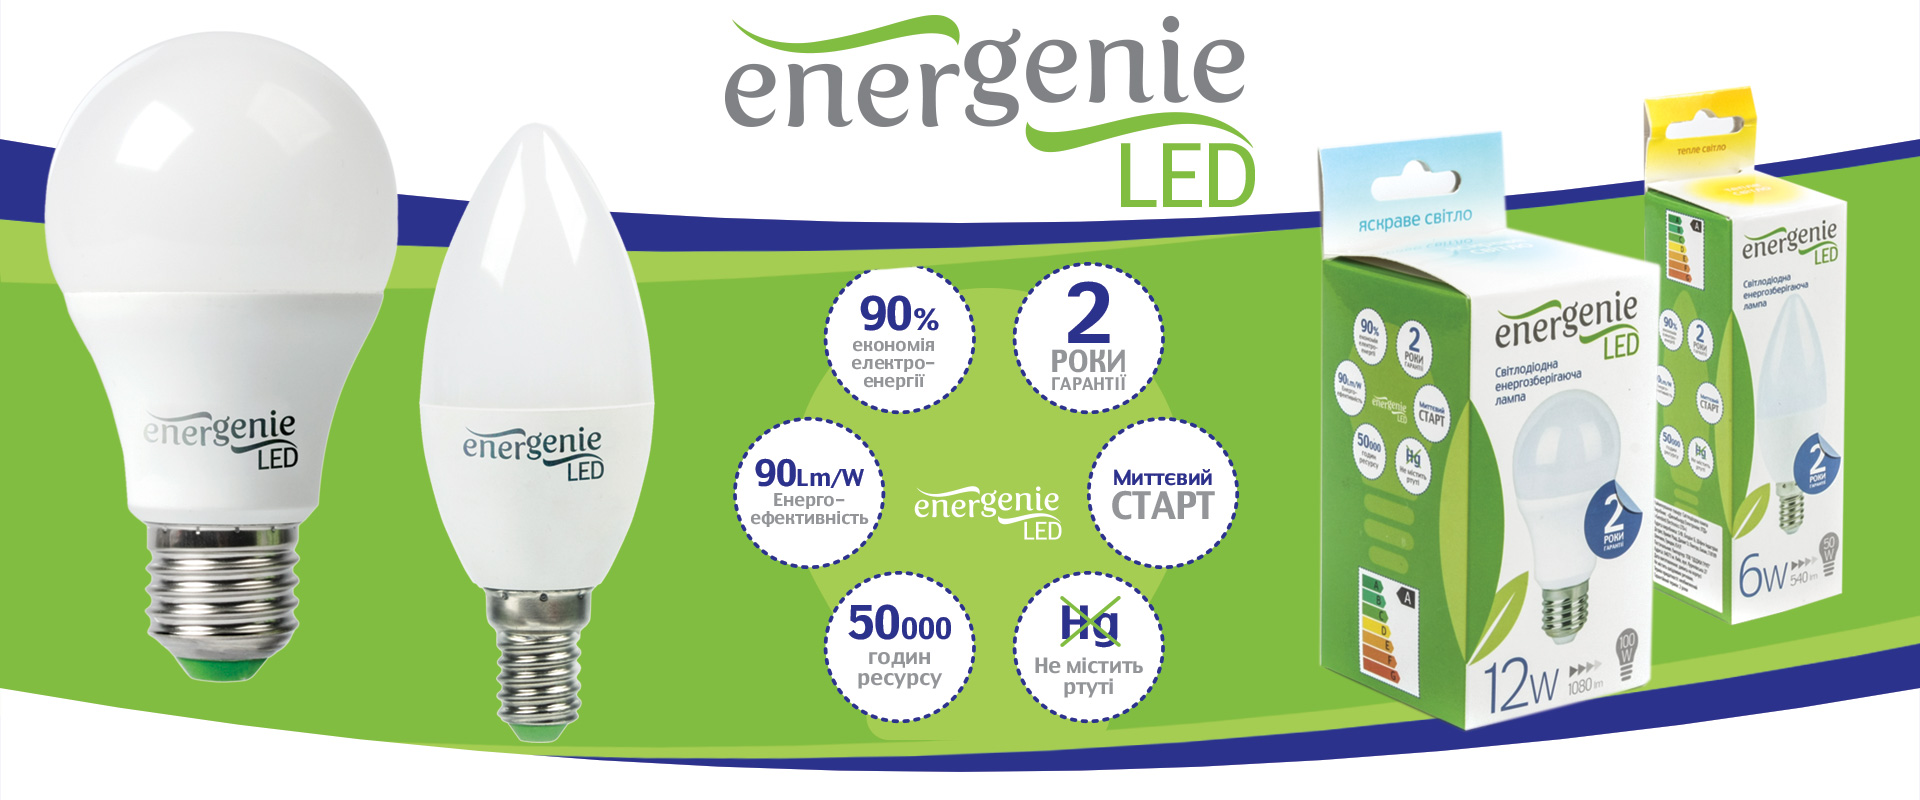 НОВИНКИ! LED лампы торговой марки EnerGenie.